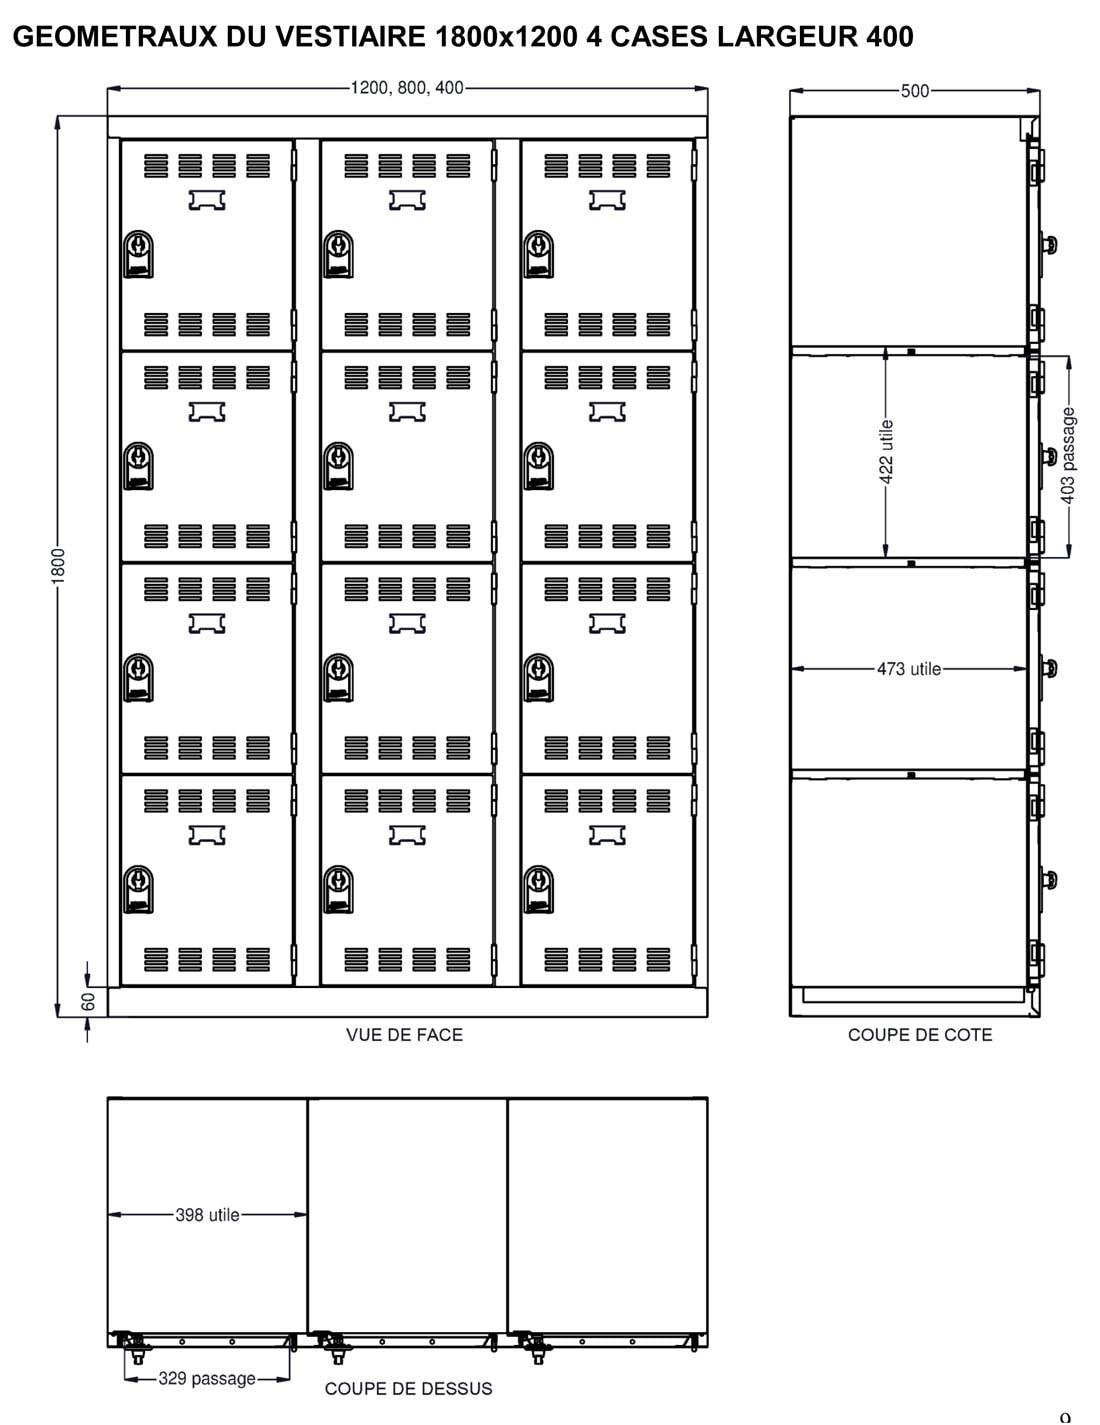 Dimensions utiles du vestiaire 4 cases